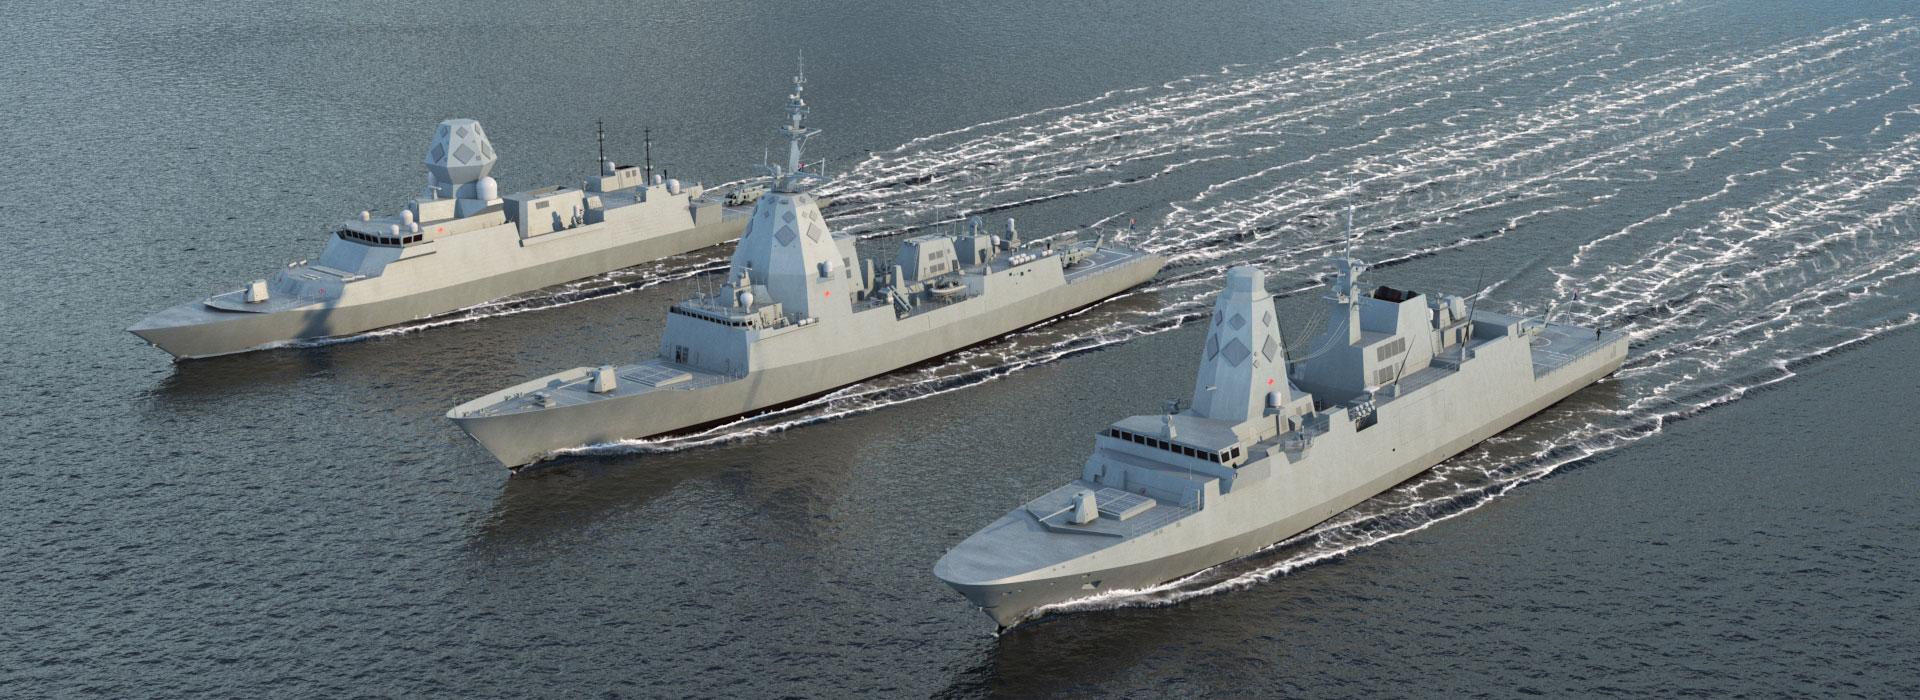 3-vessels